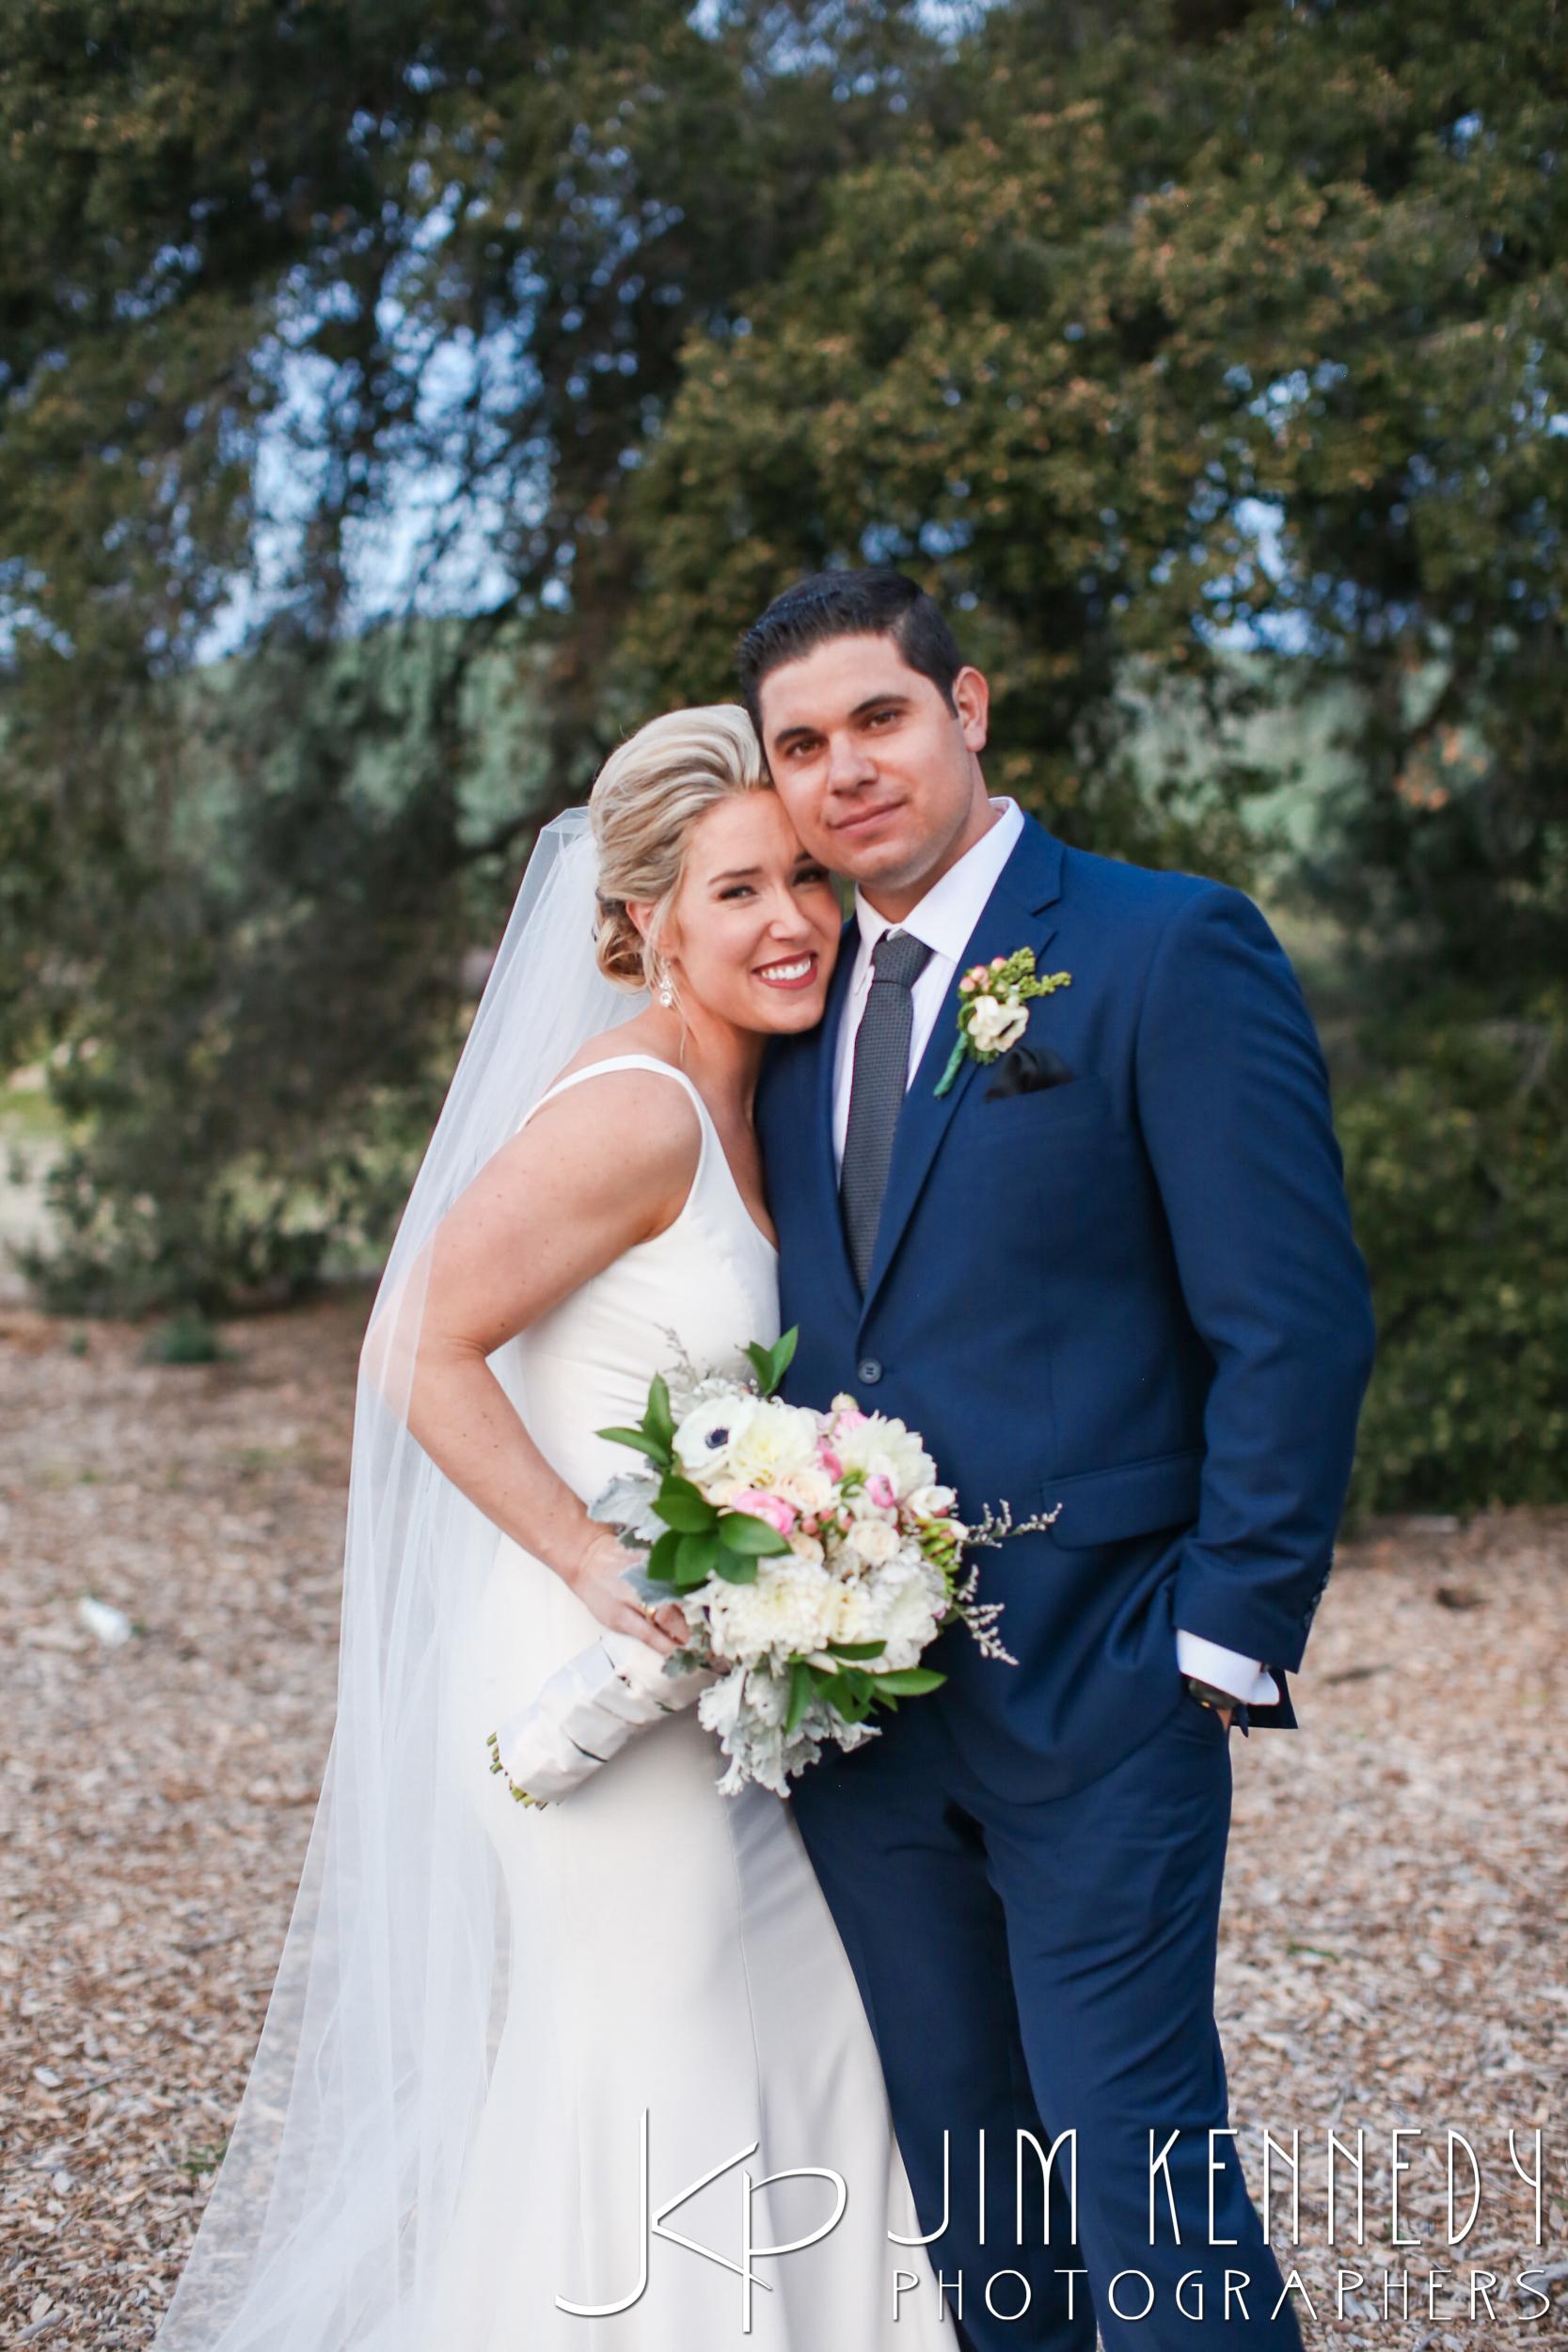 jim_kennedy_photographers_highland_springs_wedding_caitlyn_0151.jpg